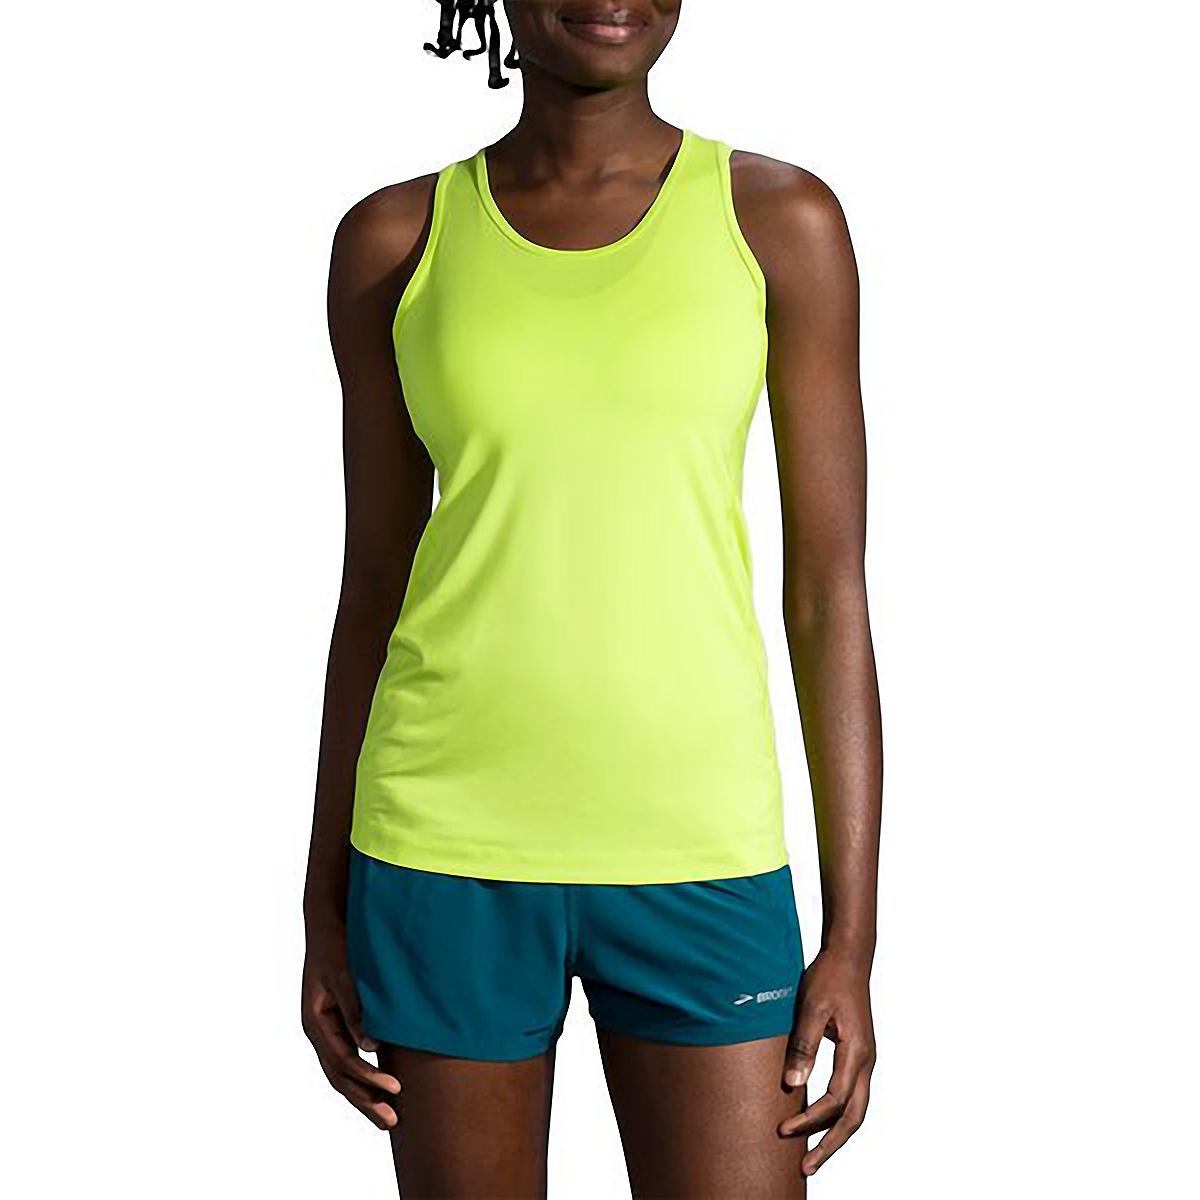 Women's Brooks Pick-Up Tank  - Color: Lime - Size: XS, Lime, large, image 1